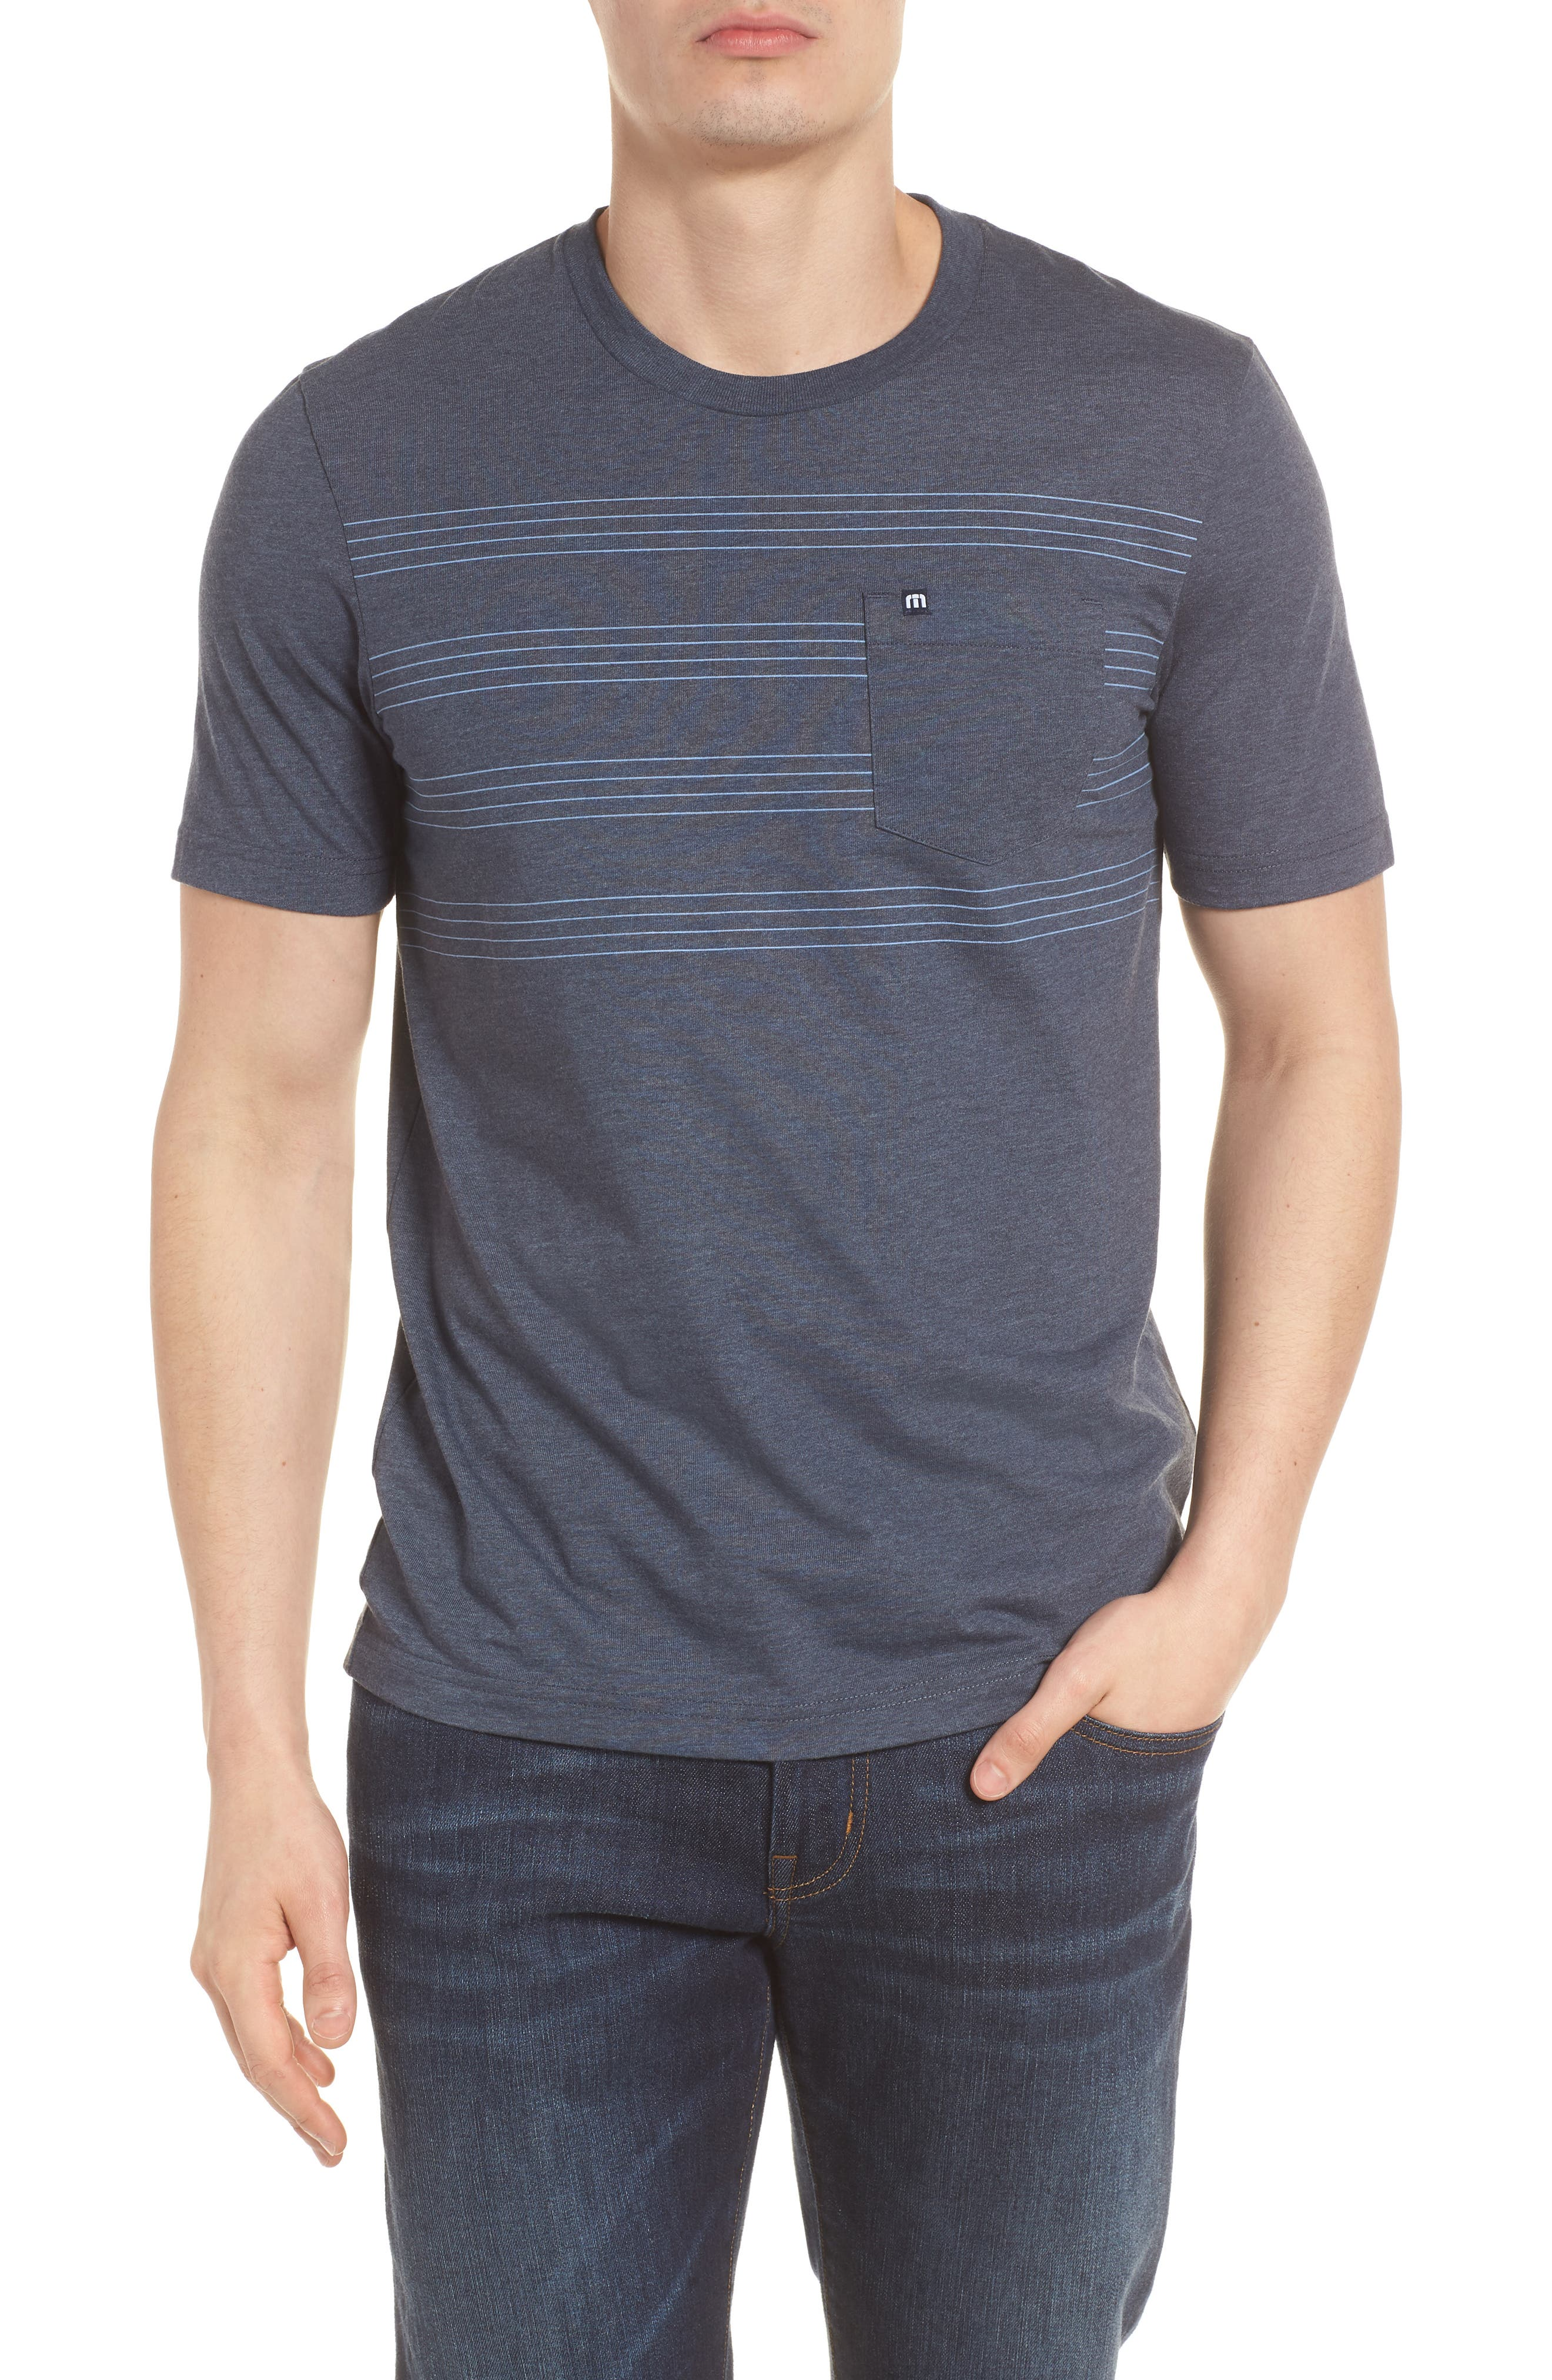 Gaviotas Crewneck T-Shirt,                         Main,                         color, Blue Nights/ Dusk Blue